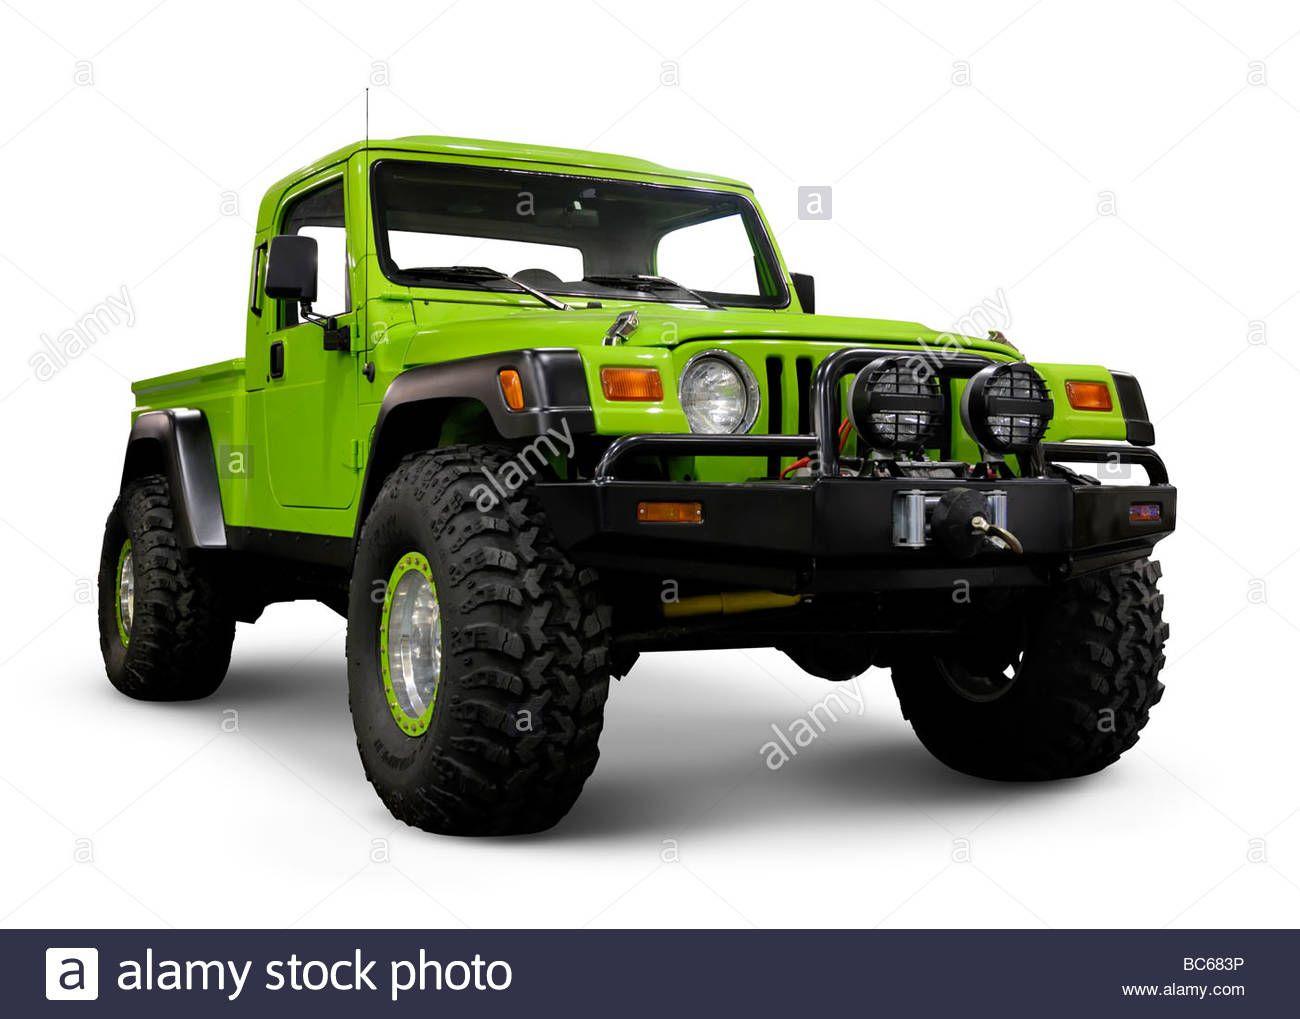 Custom jeep wrangler tj with large wheels stock photo royalty